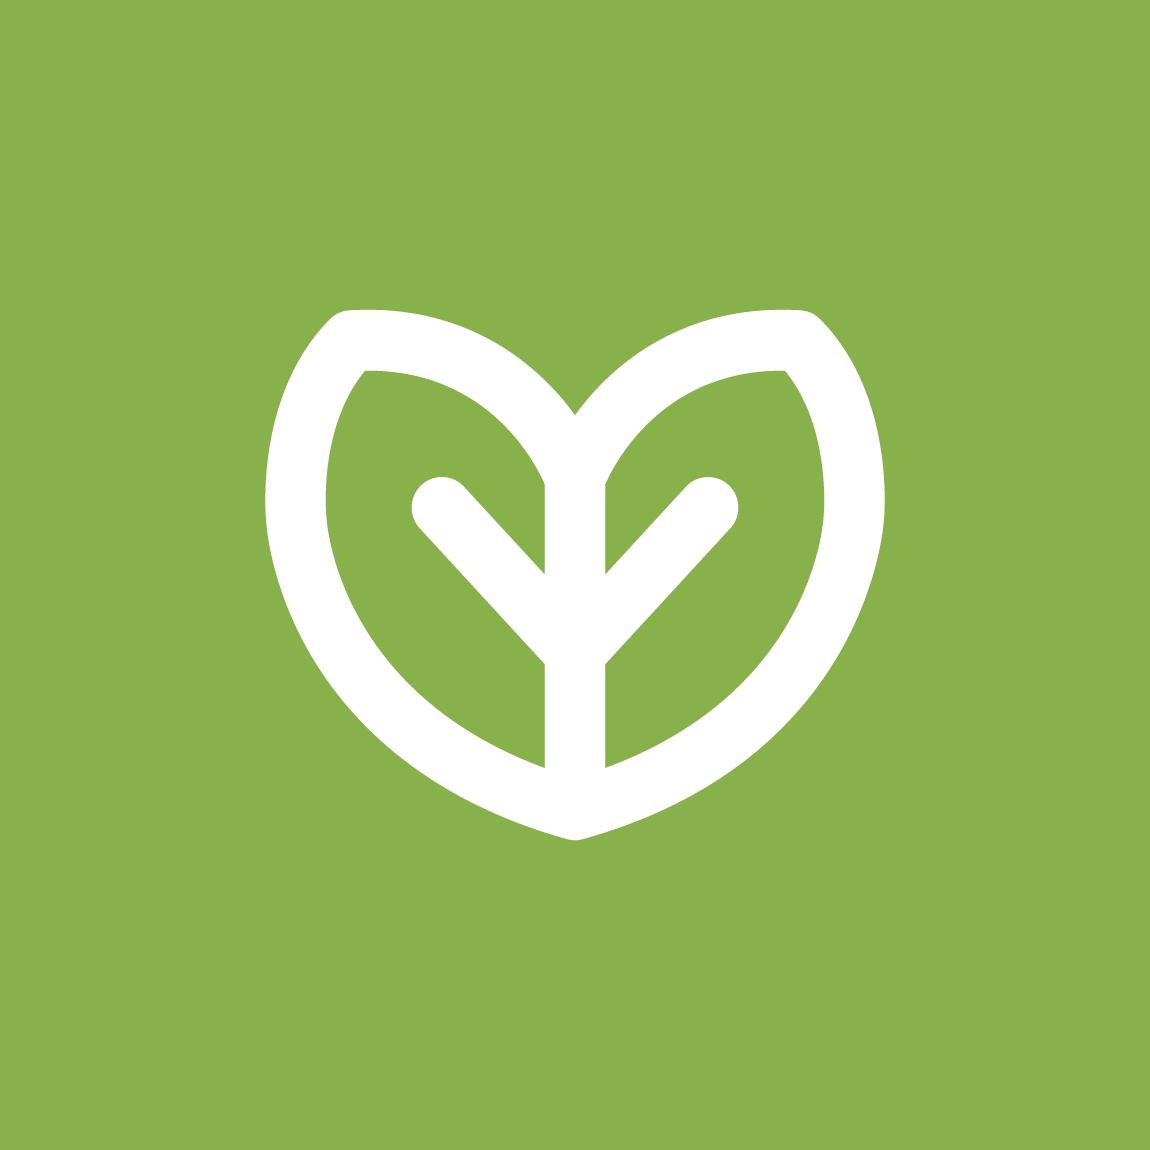 fullscript-leaf-greenery